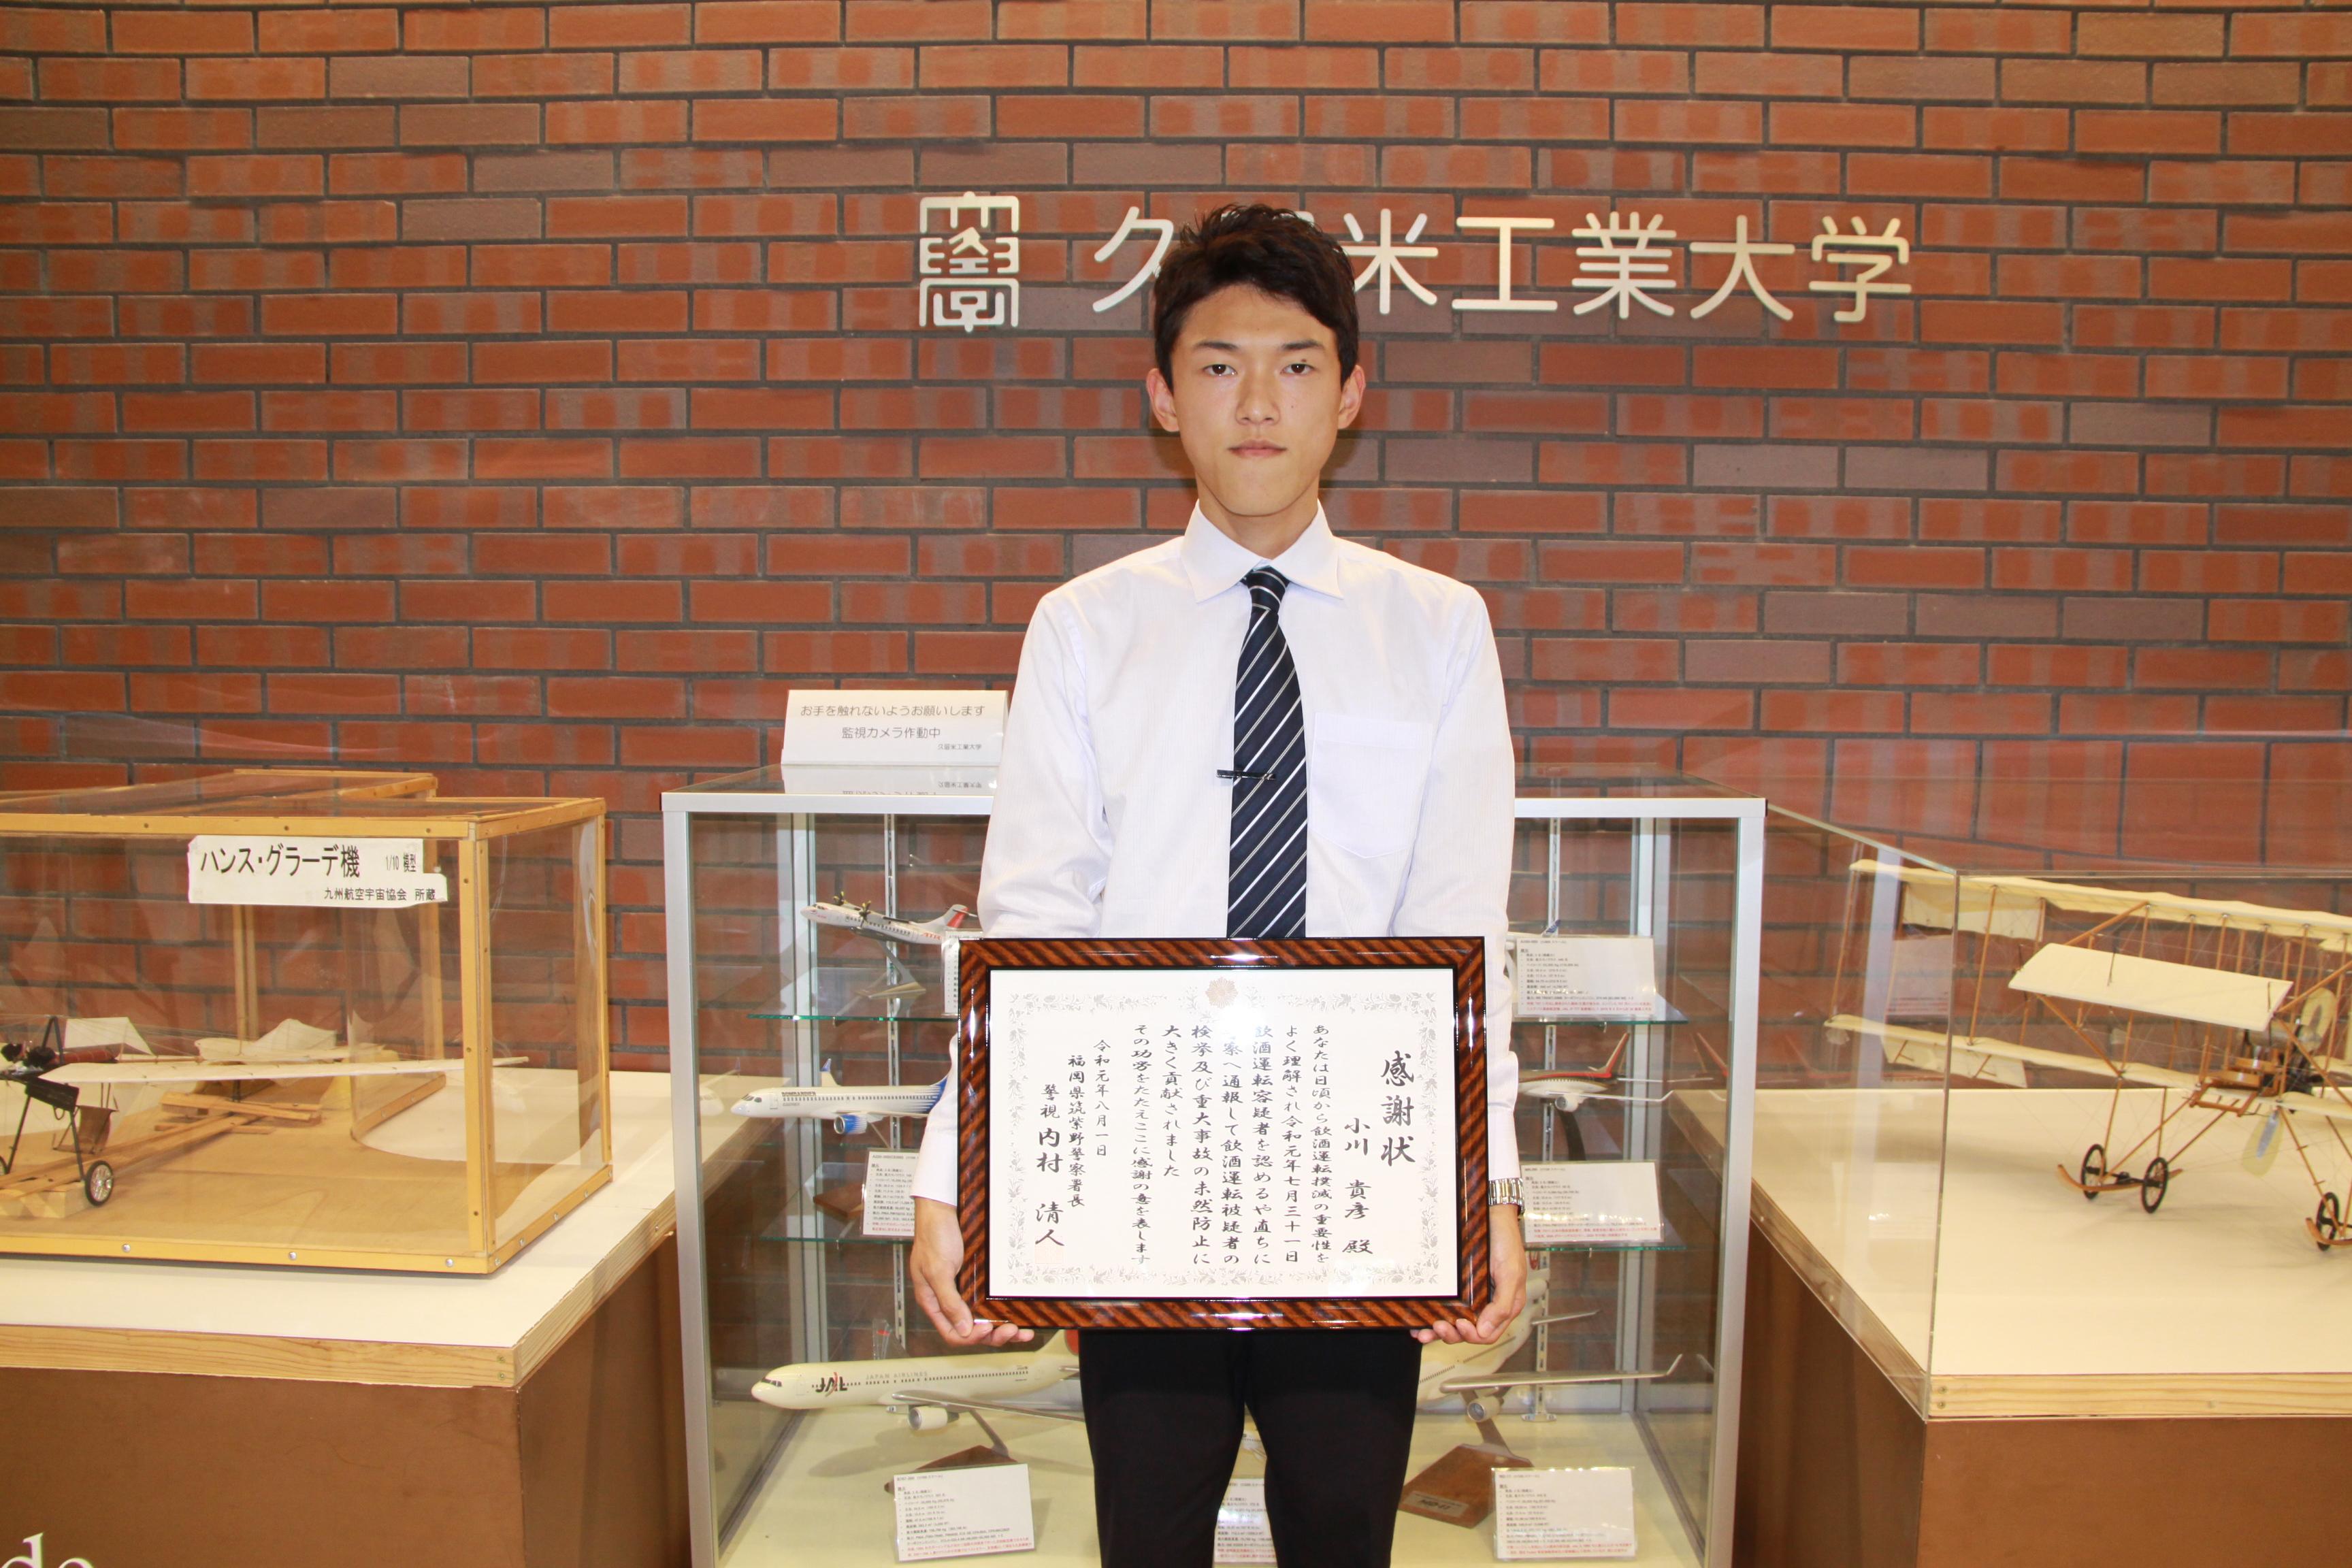 https://www.kurume-it.ac.jp/news/IMG_0475.JPG